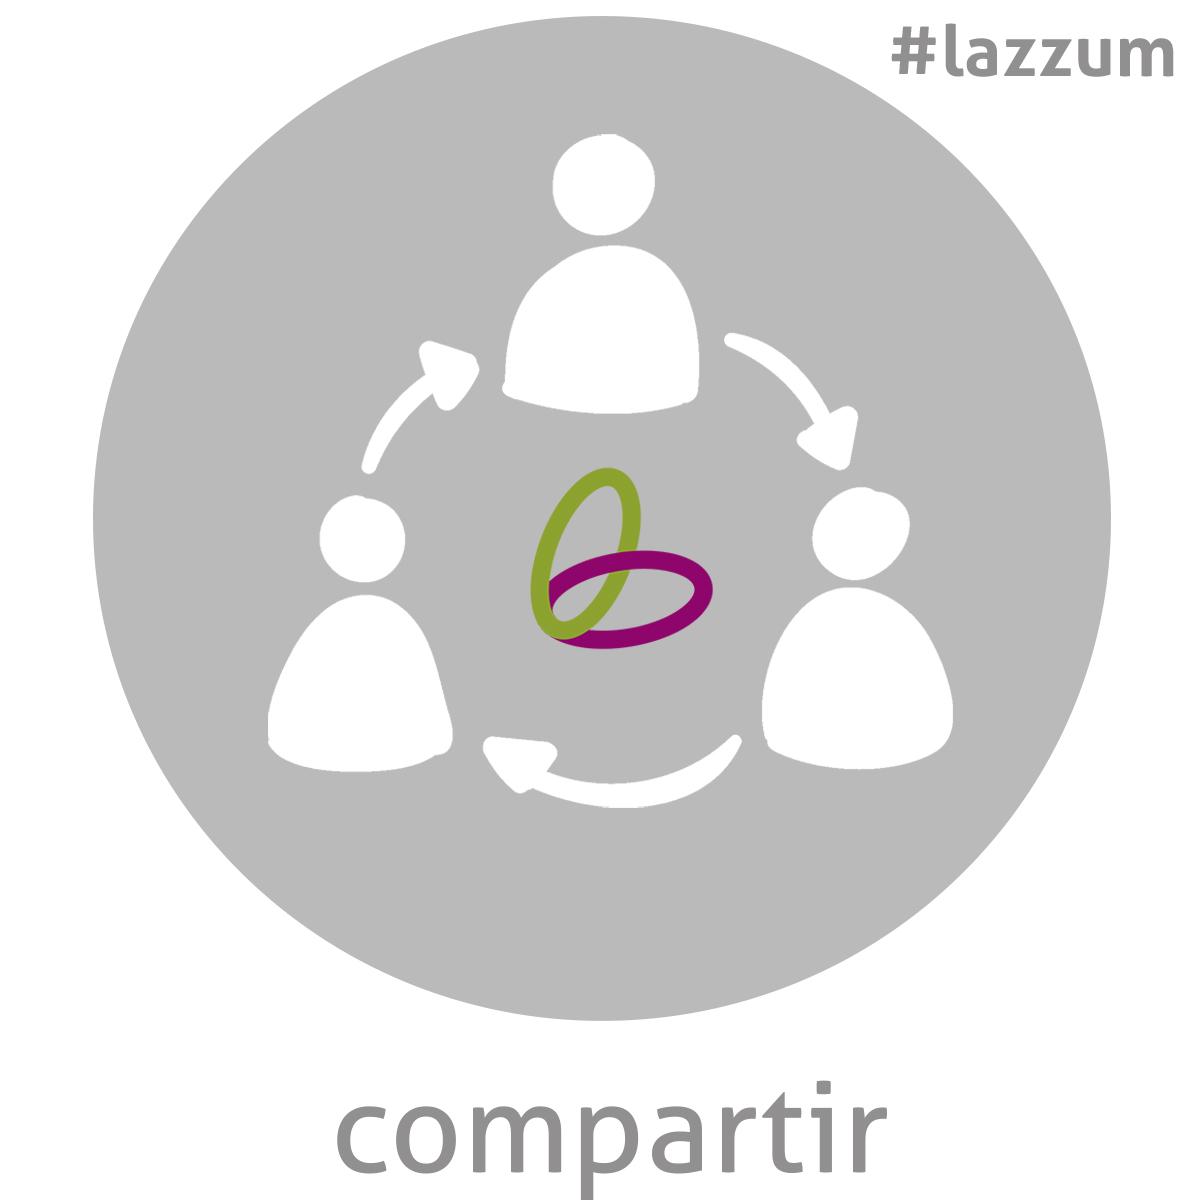 Símbolo_compartir&LogoLazzum